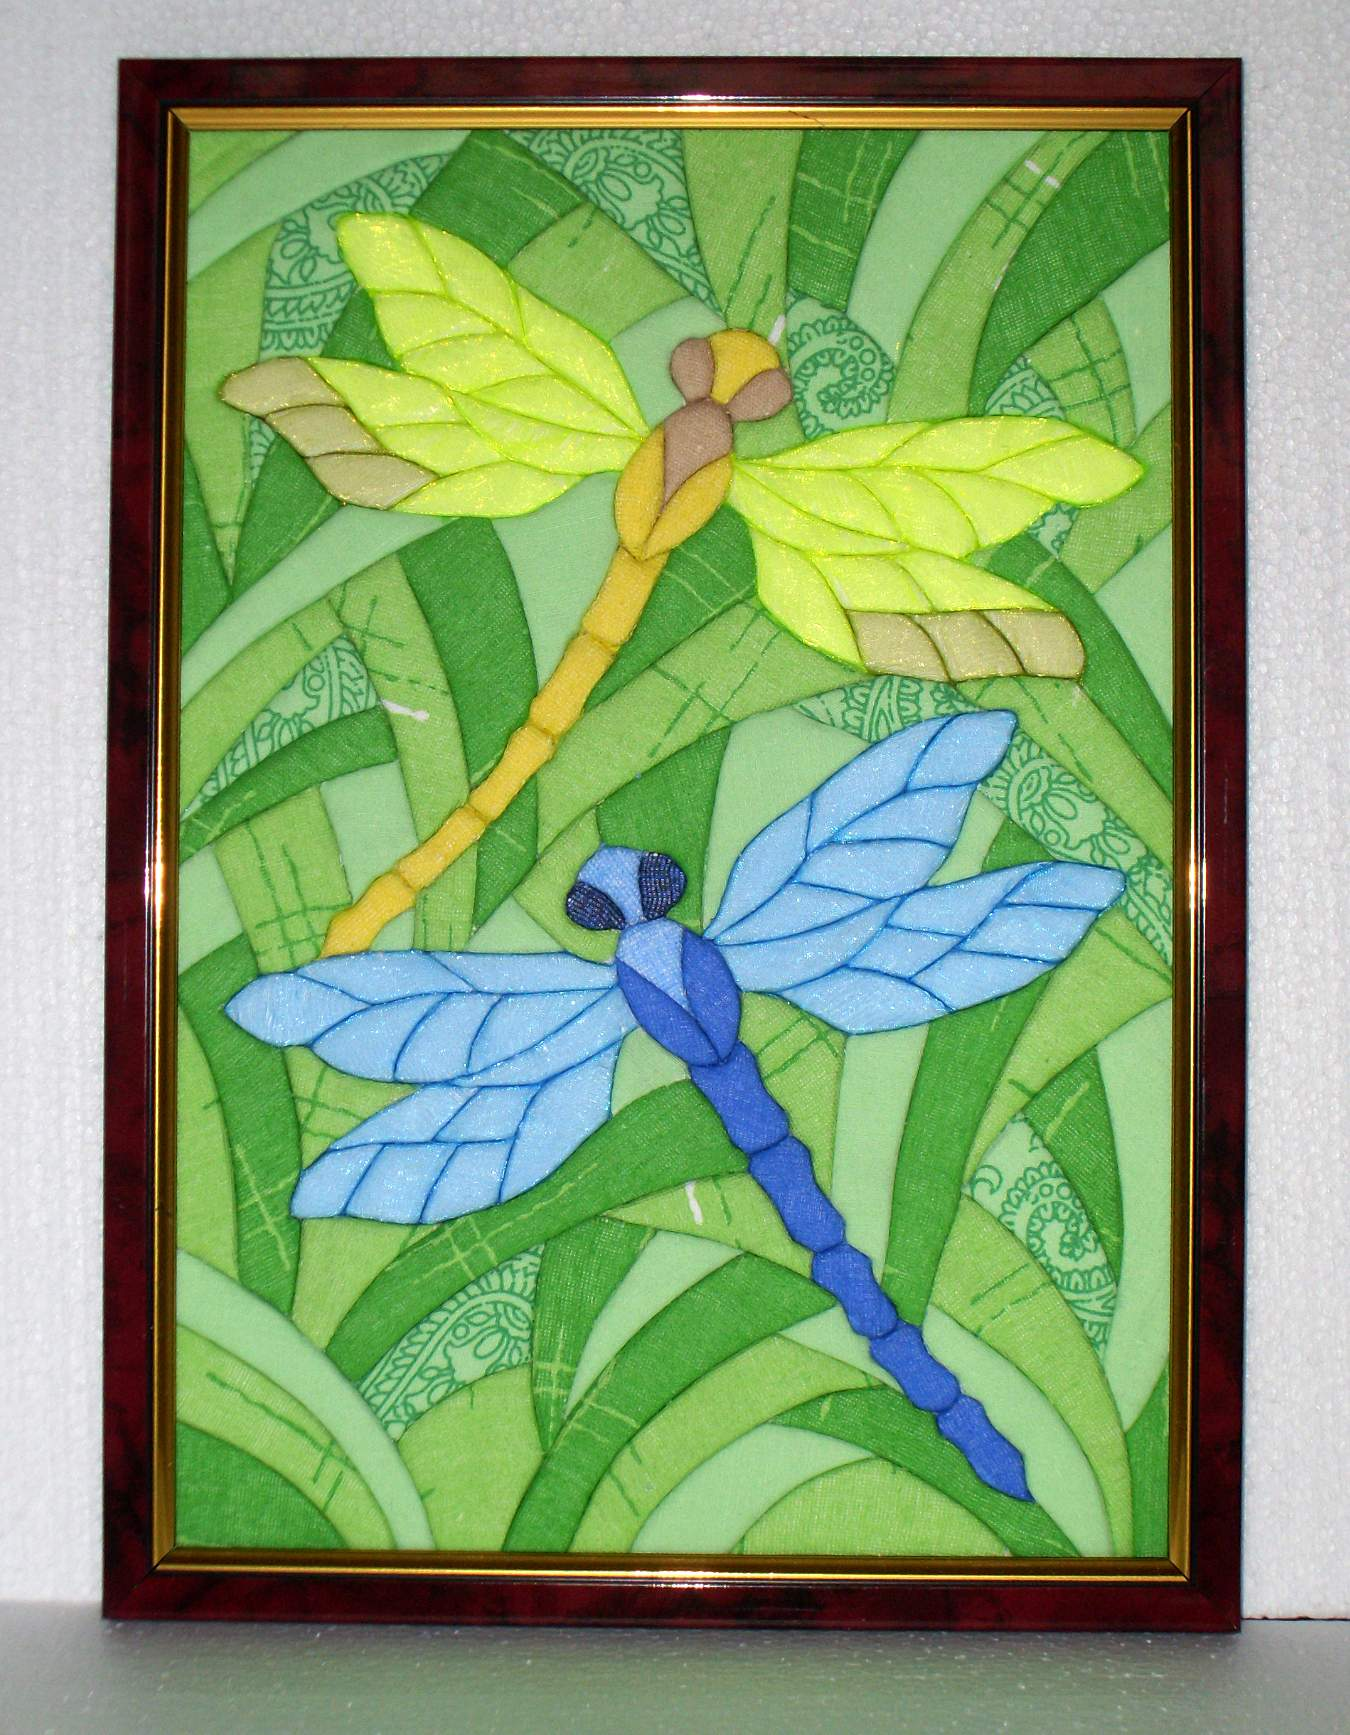 Текстильная картина со стрекозами